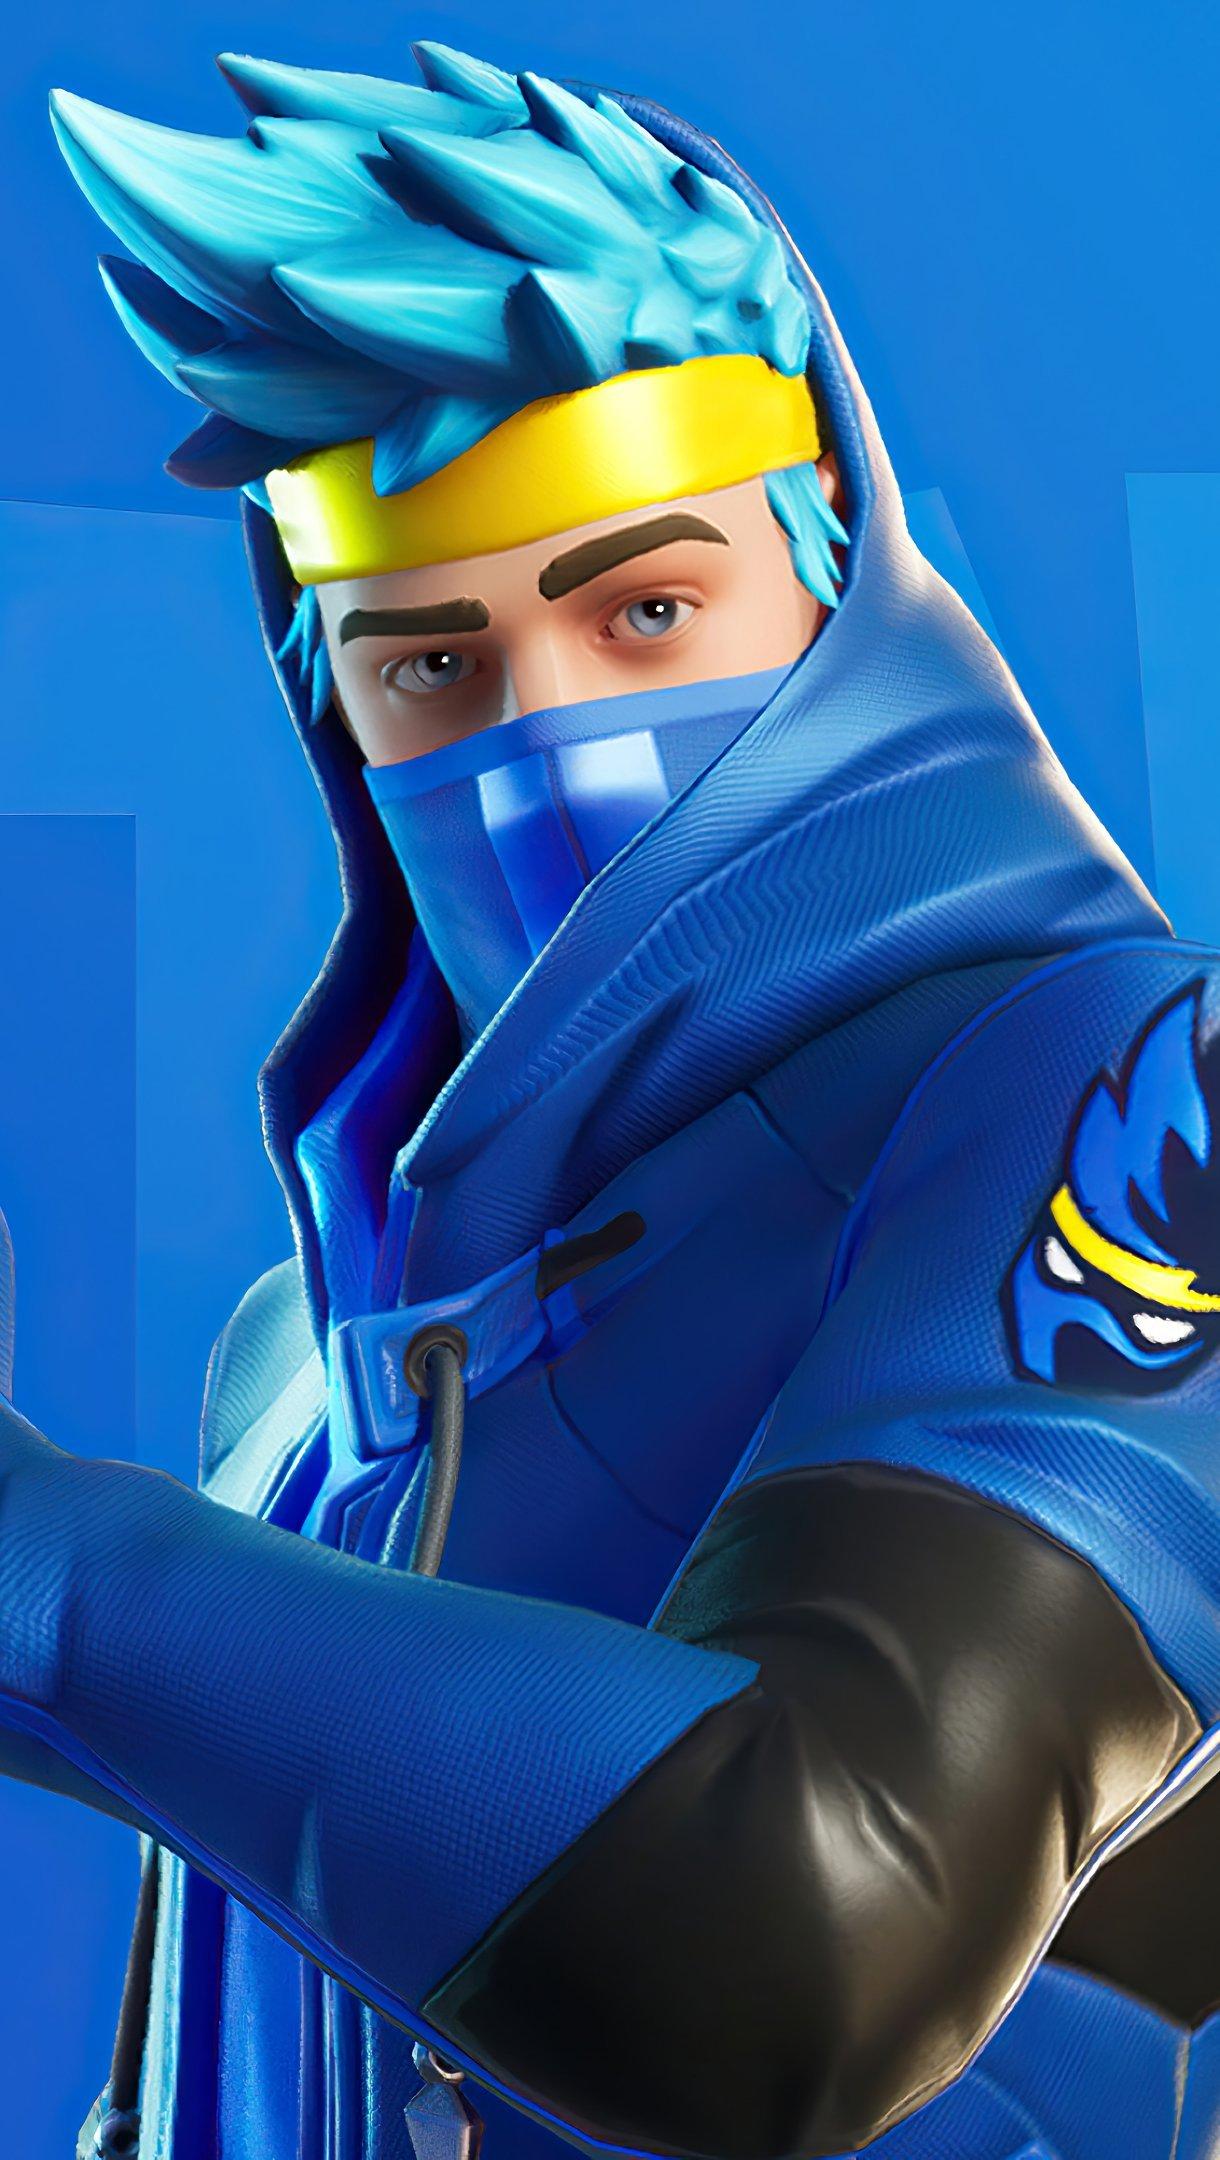 Fondos de pantalla Ninja Fortnite Battle Royale Skin Vertical